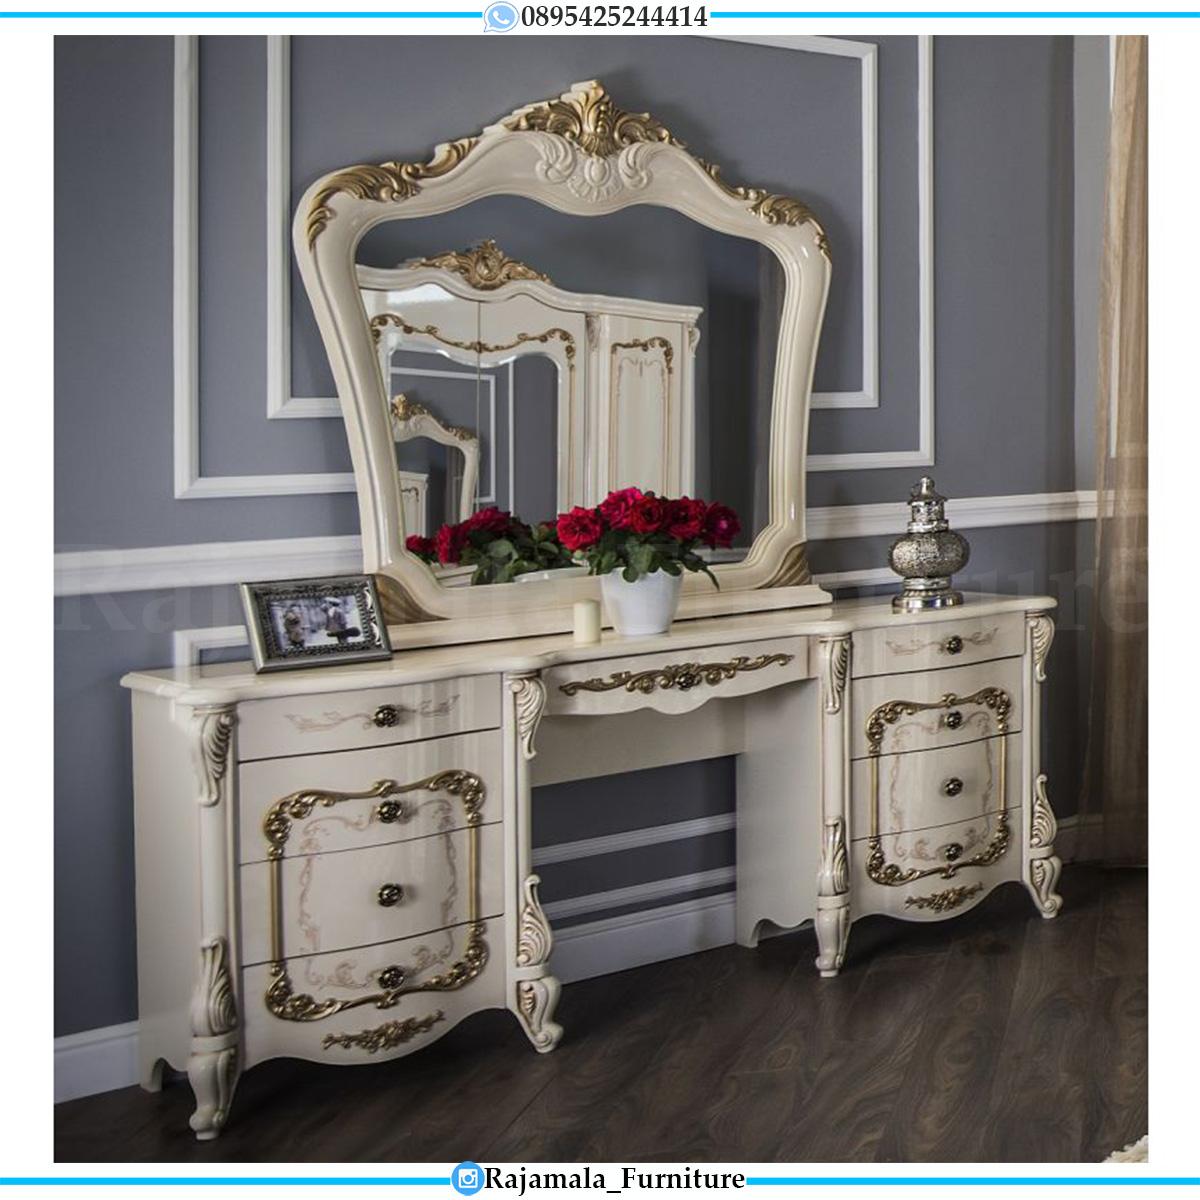 Harga Meja Rias Ukiran Jepara Luxury White Duco Glossy Elegant RM-0551